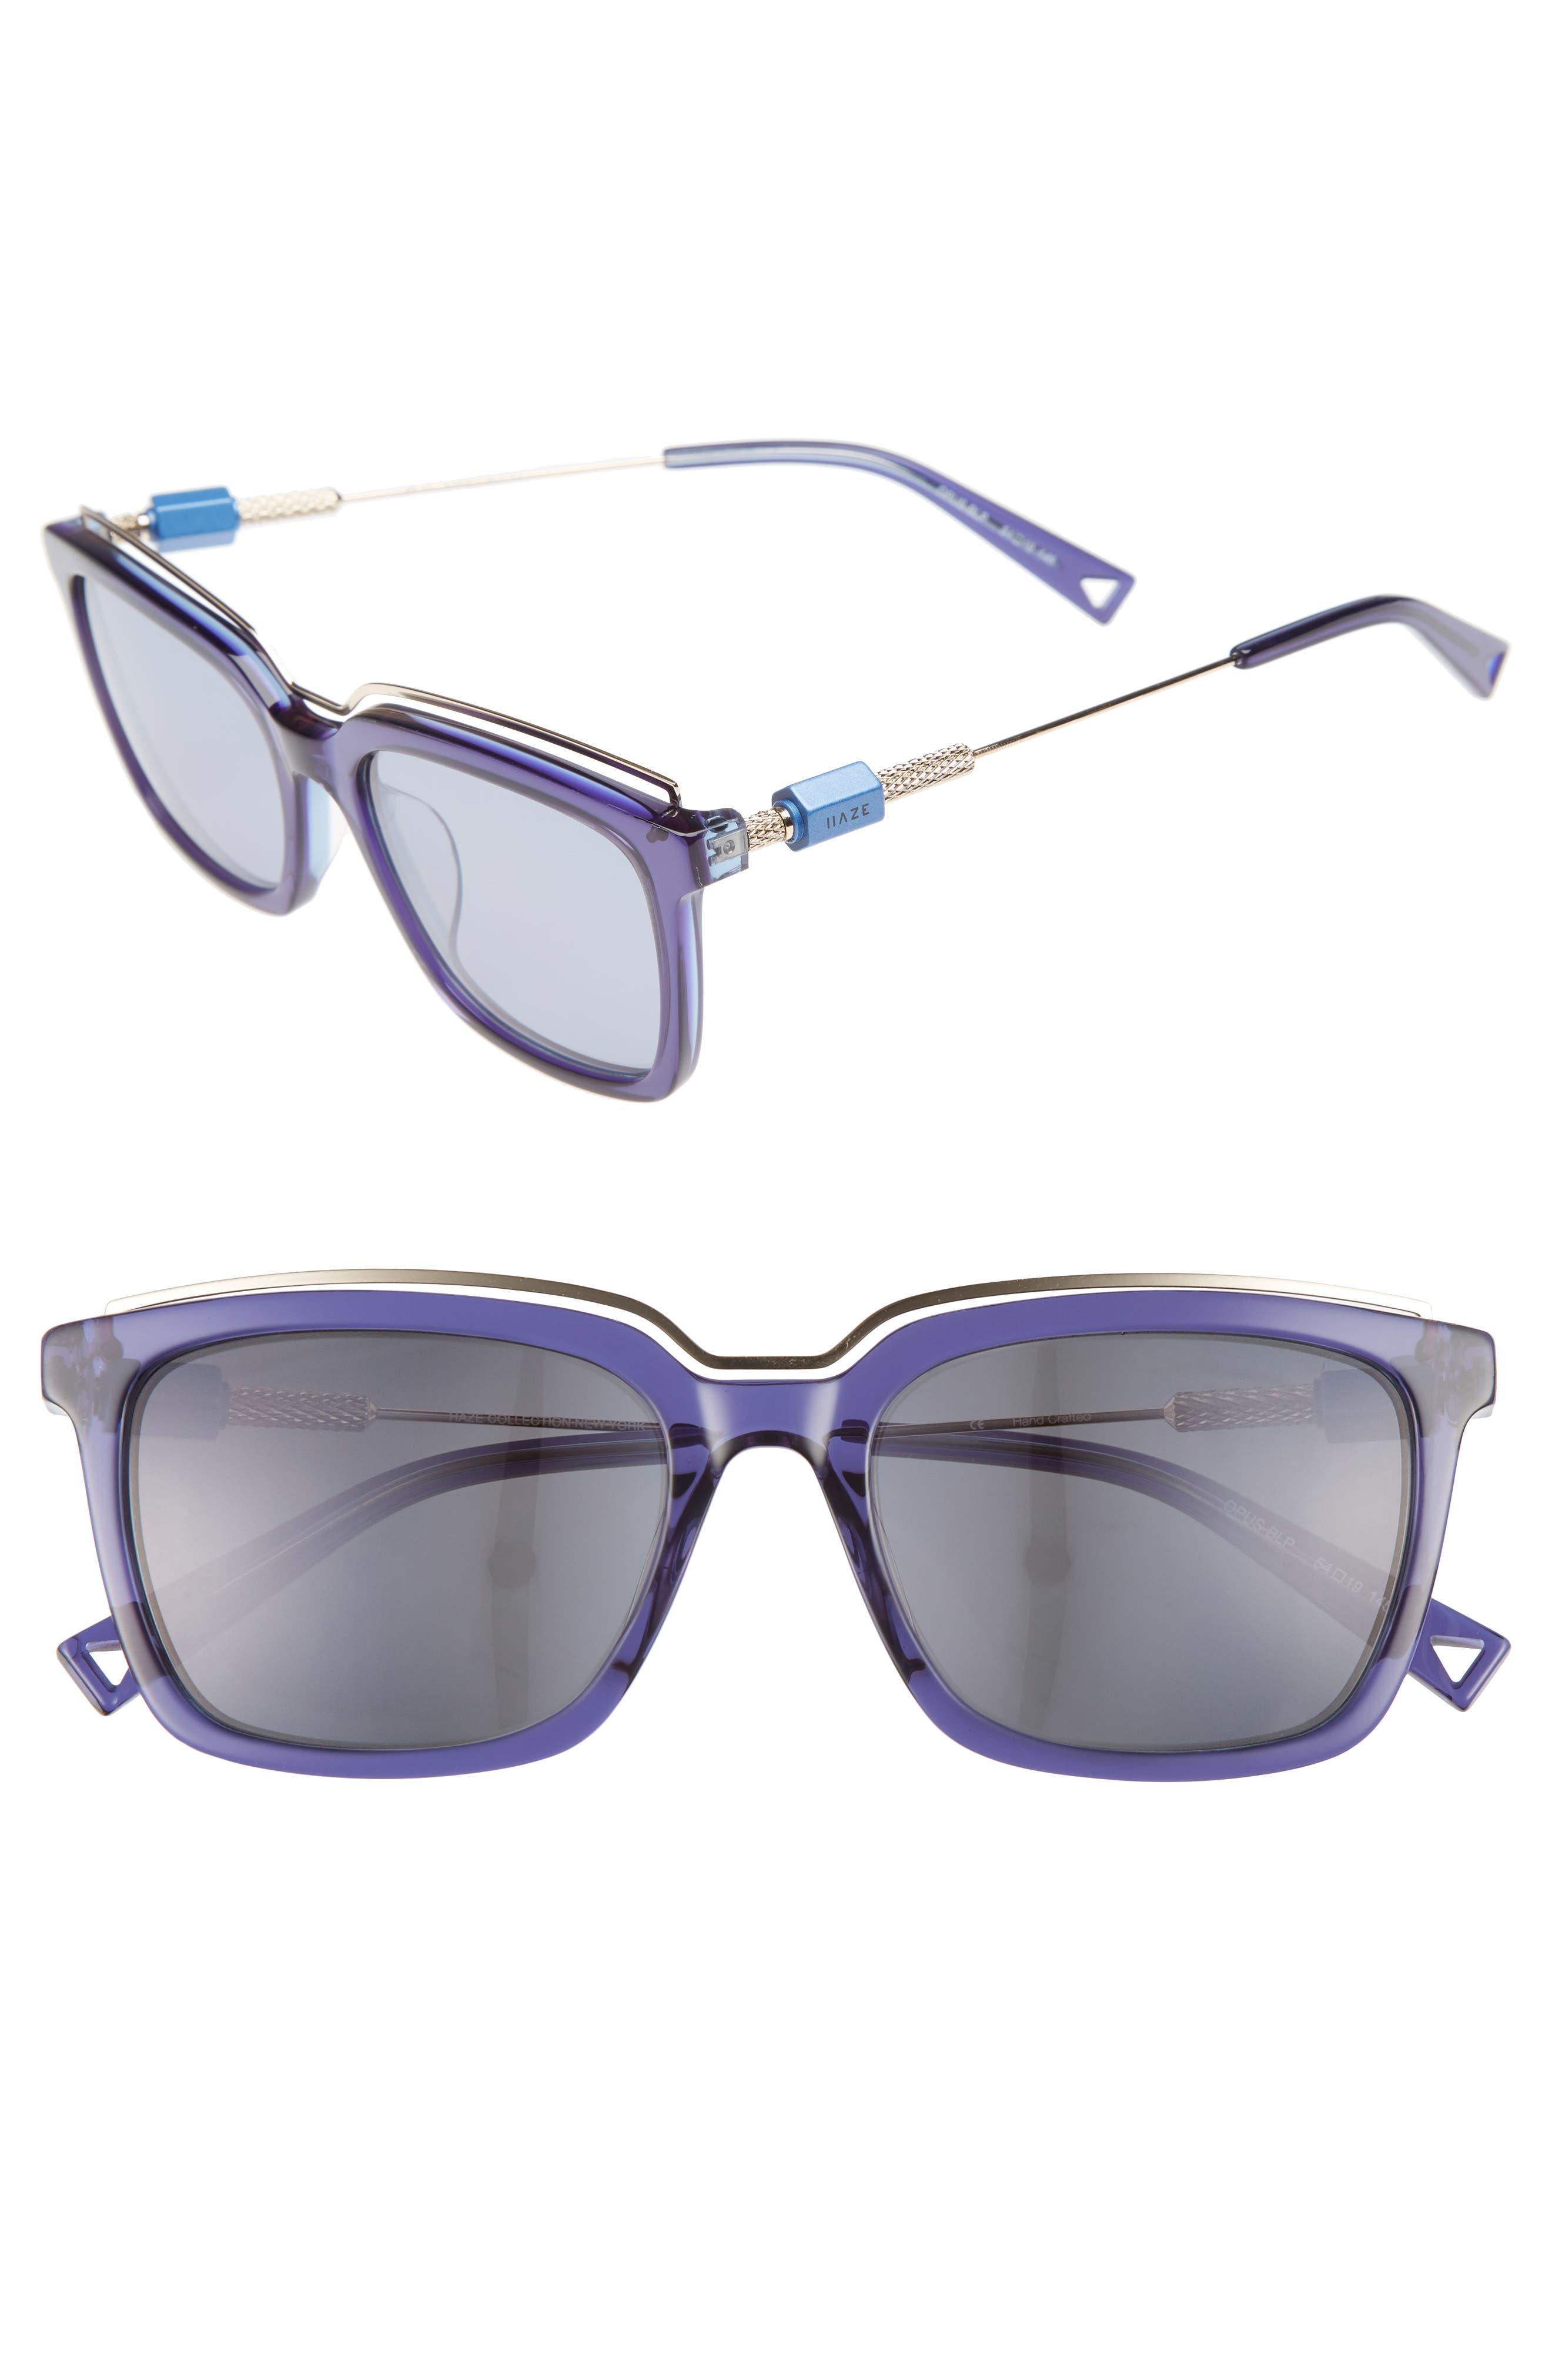 Opus 54mm Sunglasses,                             Main thumbnail 3, color,